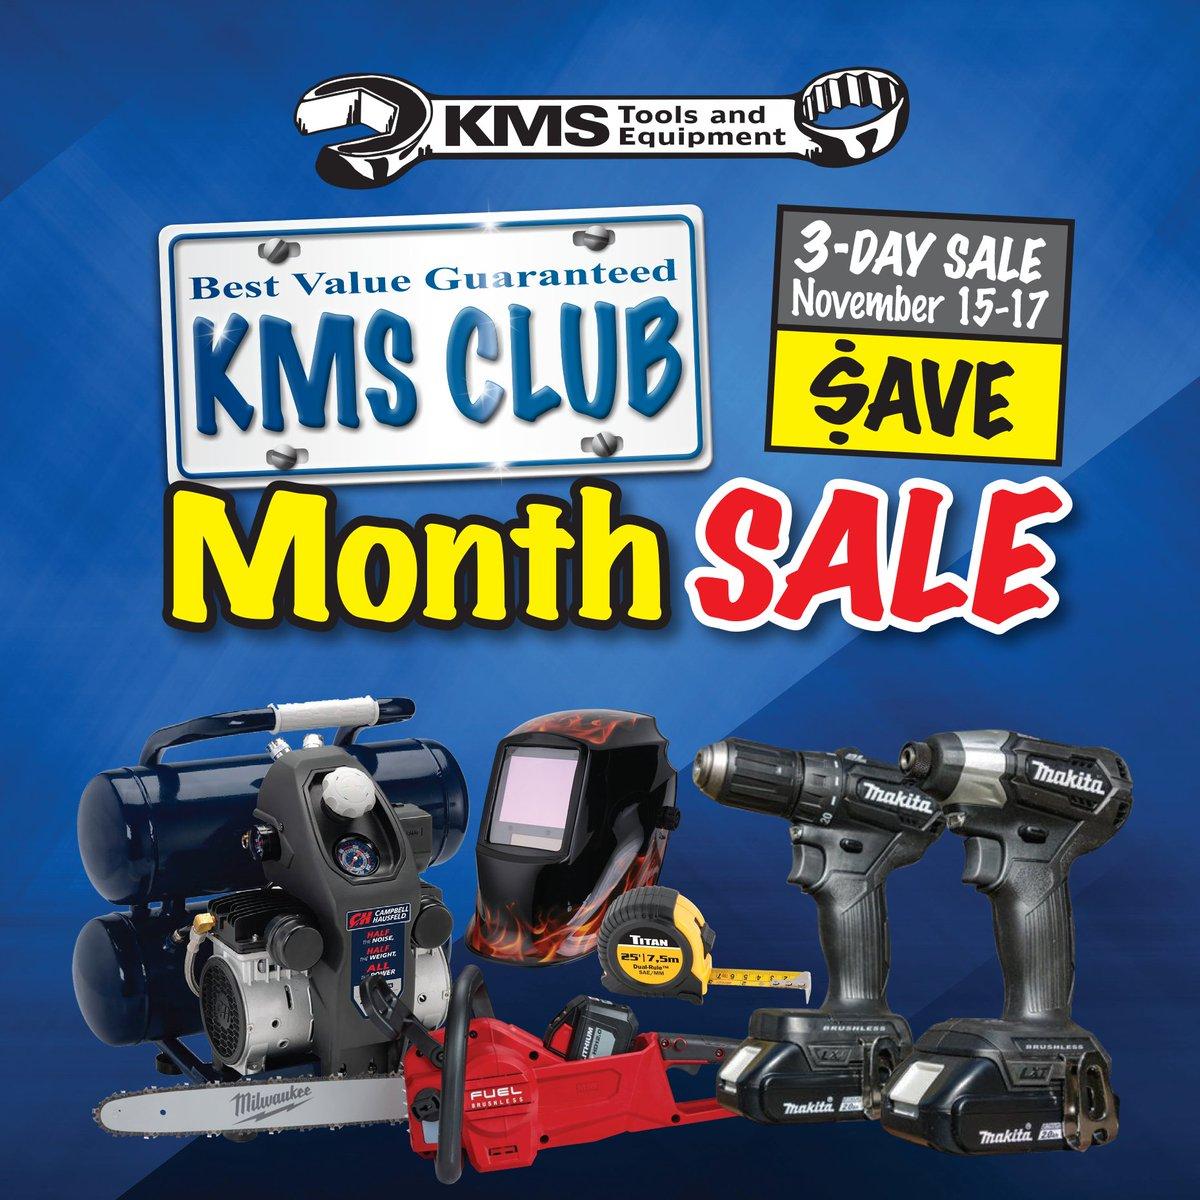 kms tools